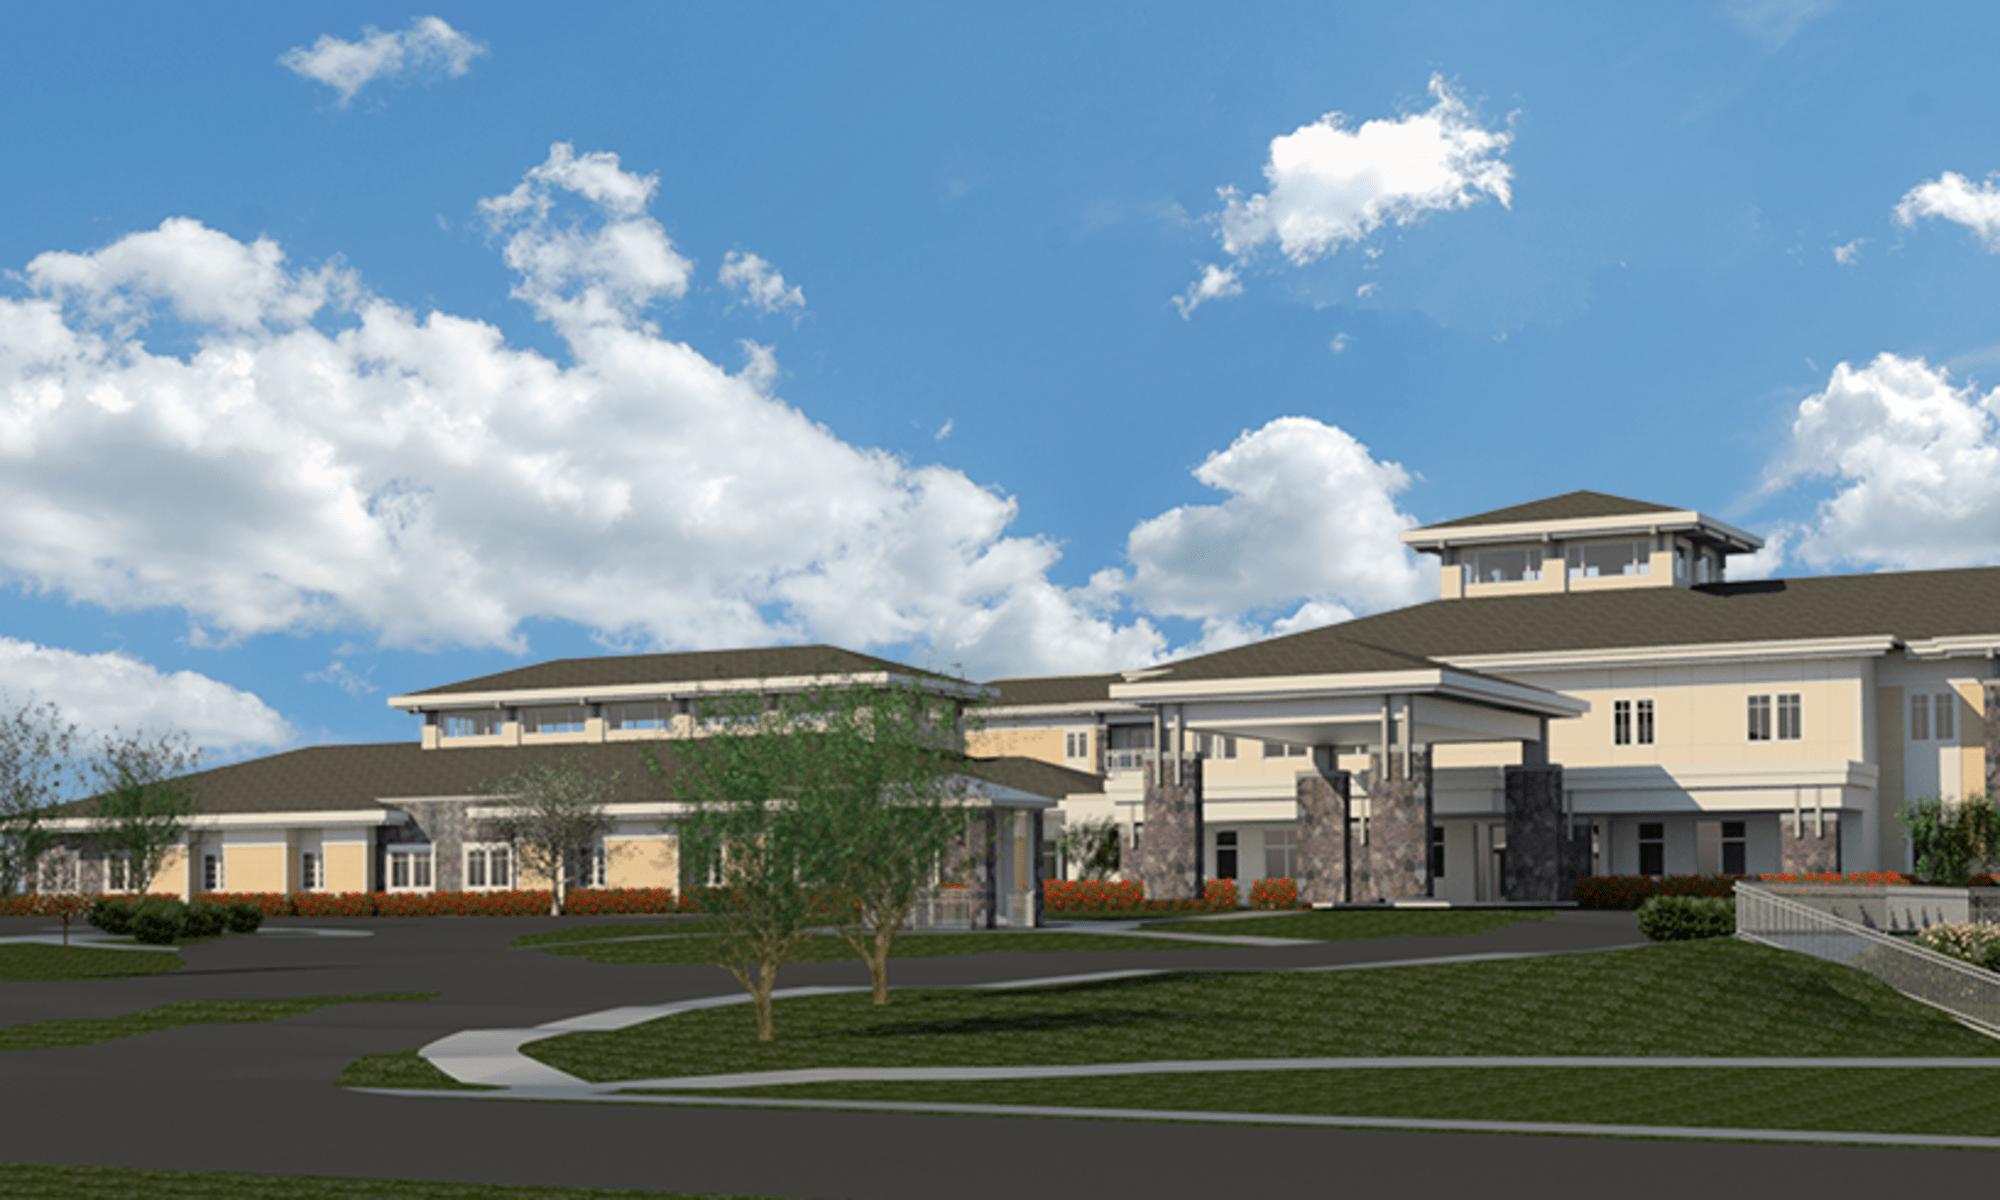 Exquisite senior living facility located in Wilmington, Delaware